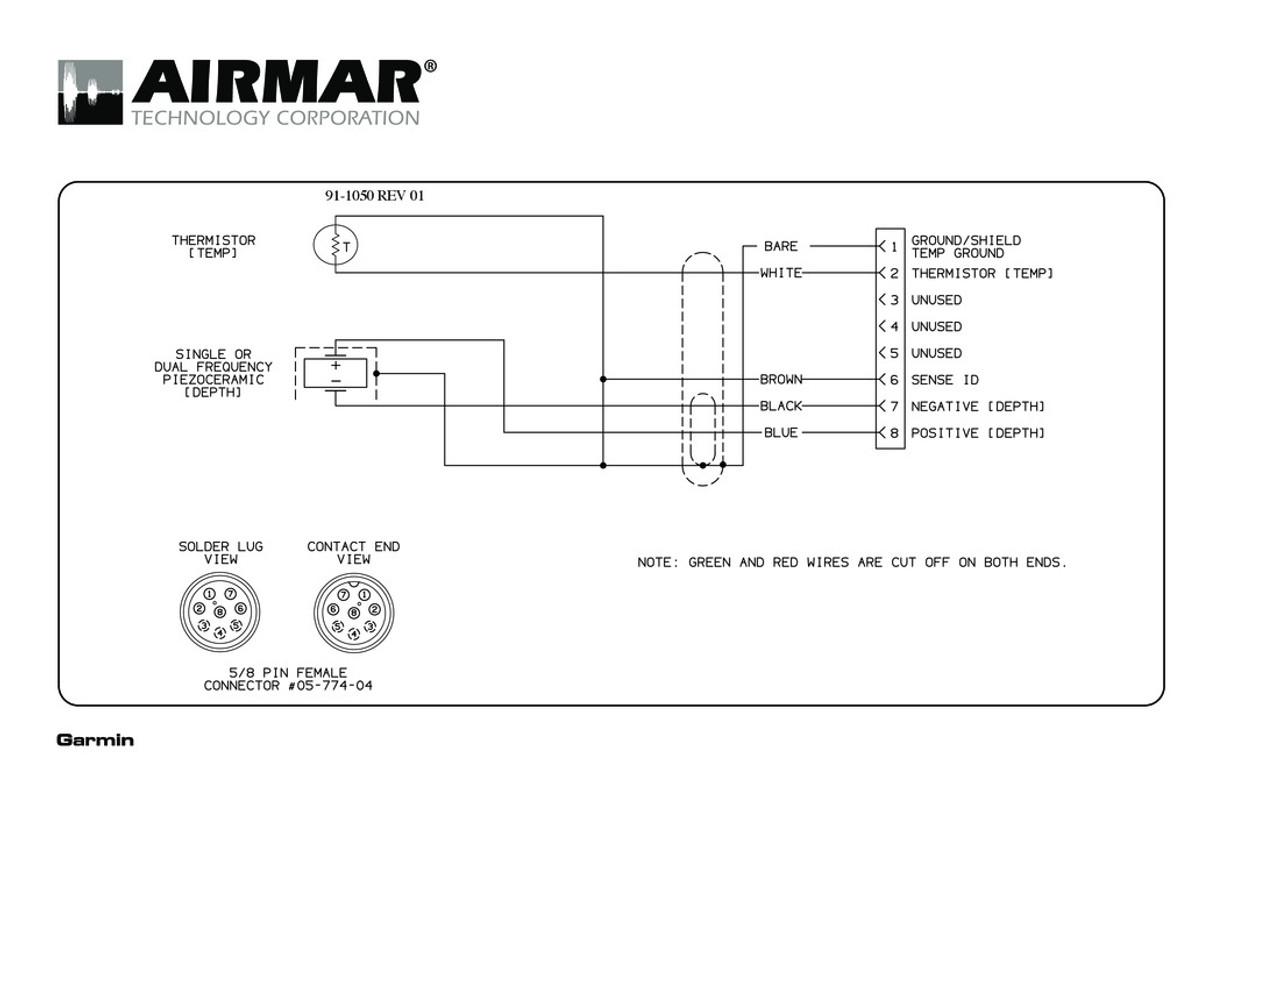 hight resolution of  garmin 17 gps wiring diagram wiring diagrams schematics garmin 3010c manual operator 18 5 wiring diagram